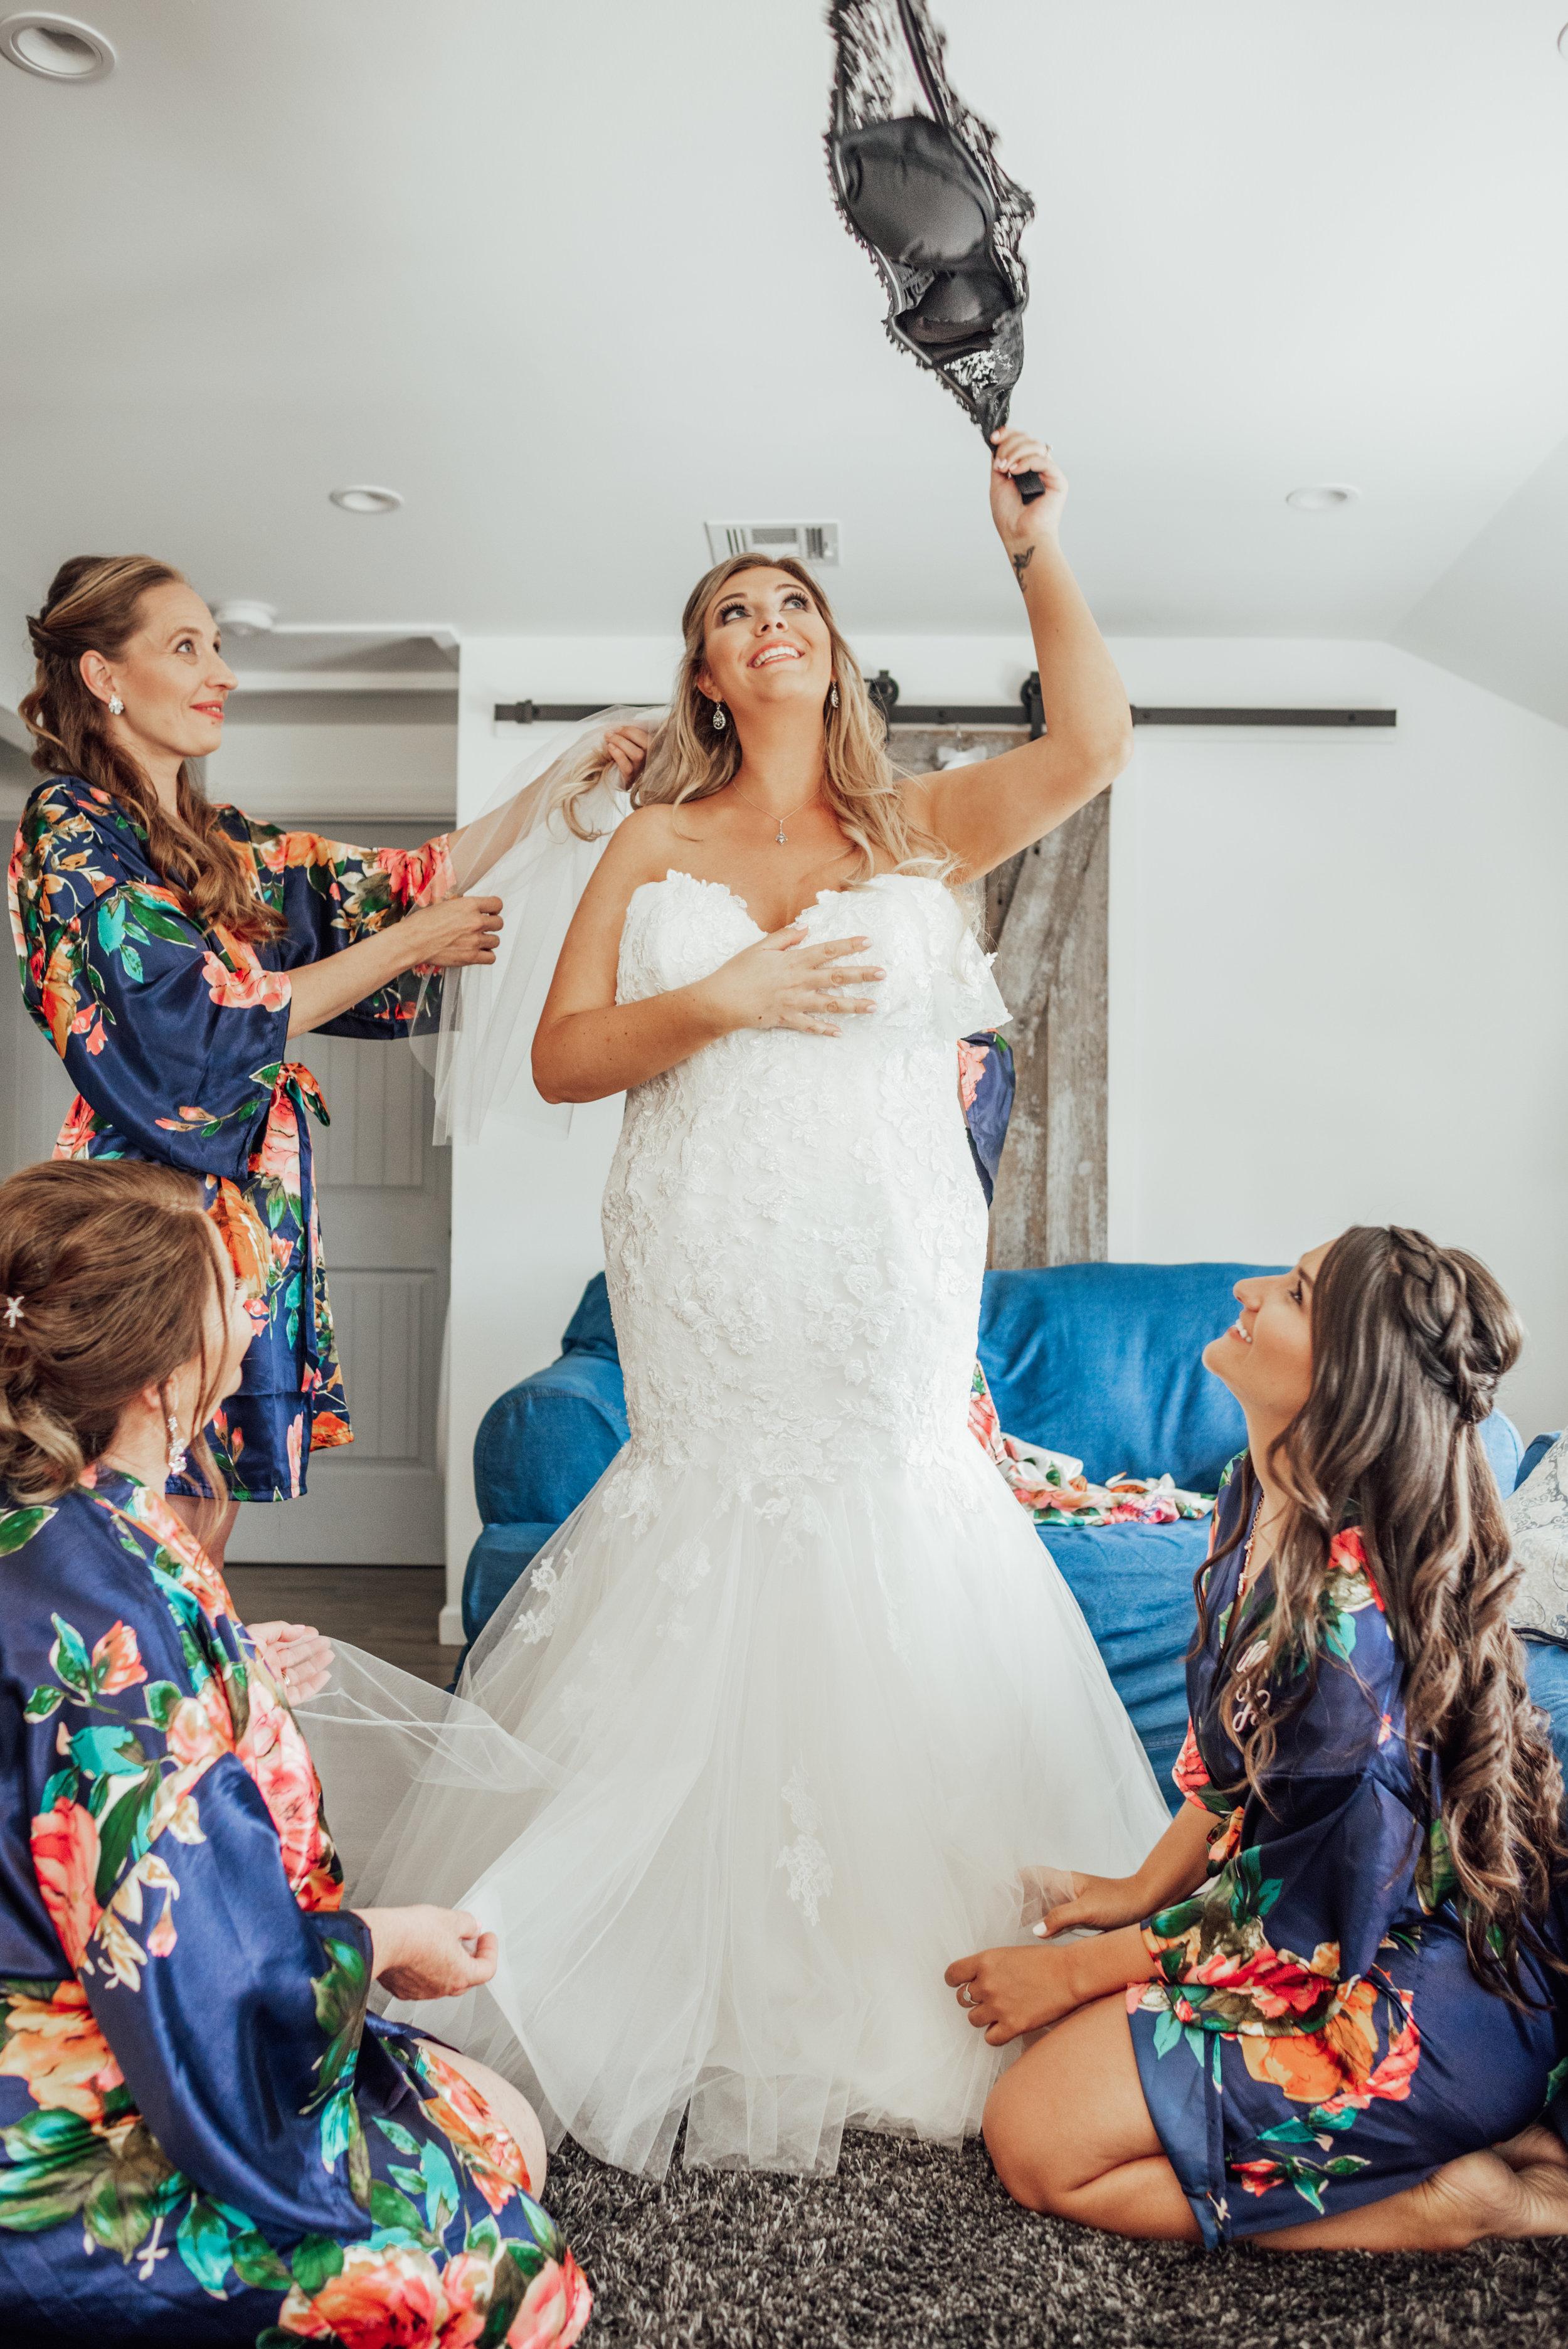 New Jersey Wedding Photographer, Felsberg Photography LBI wedding photography 29.jpg